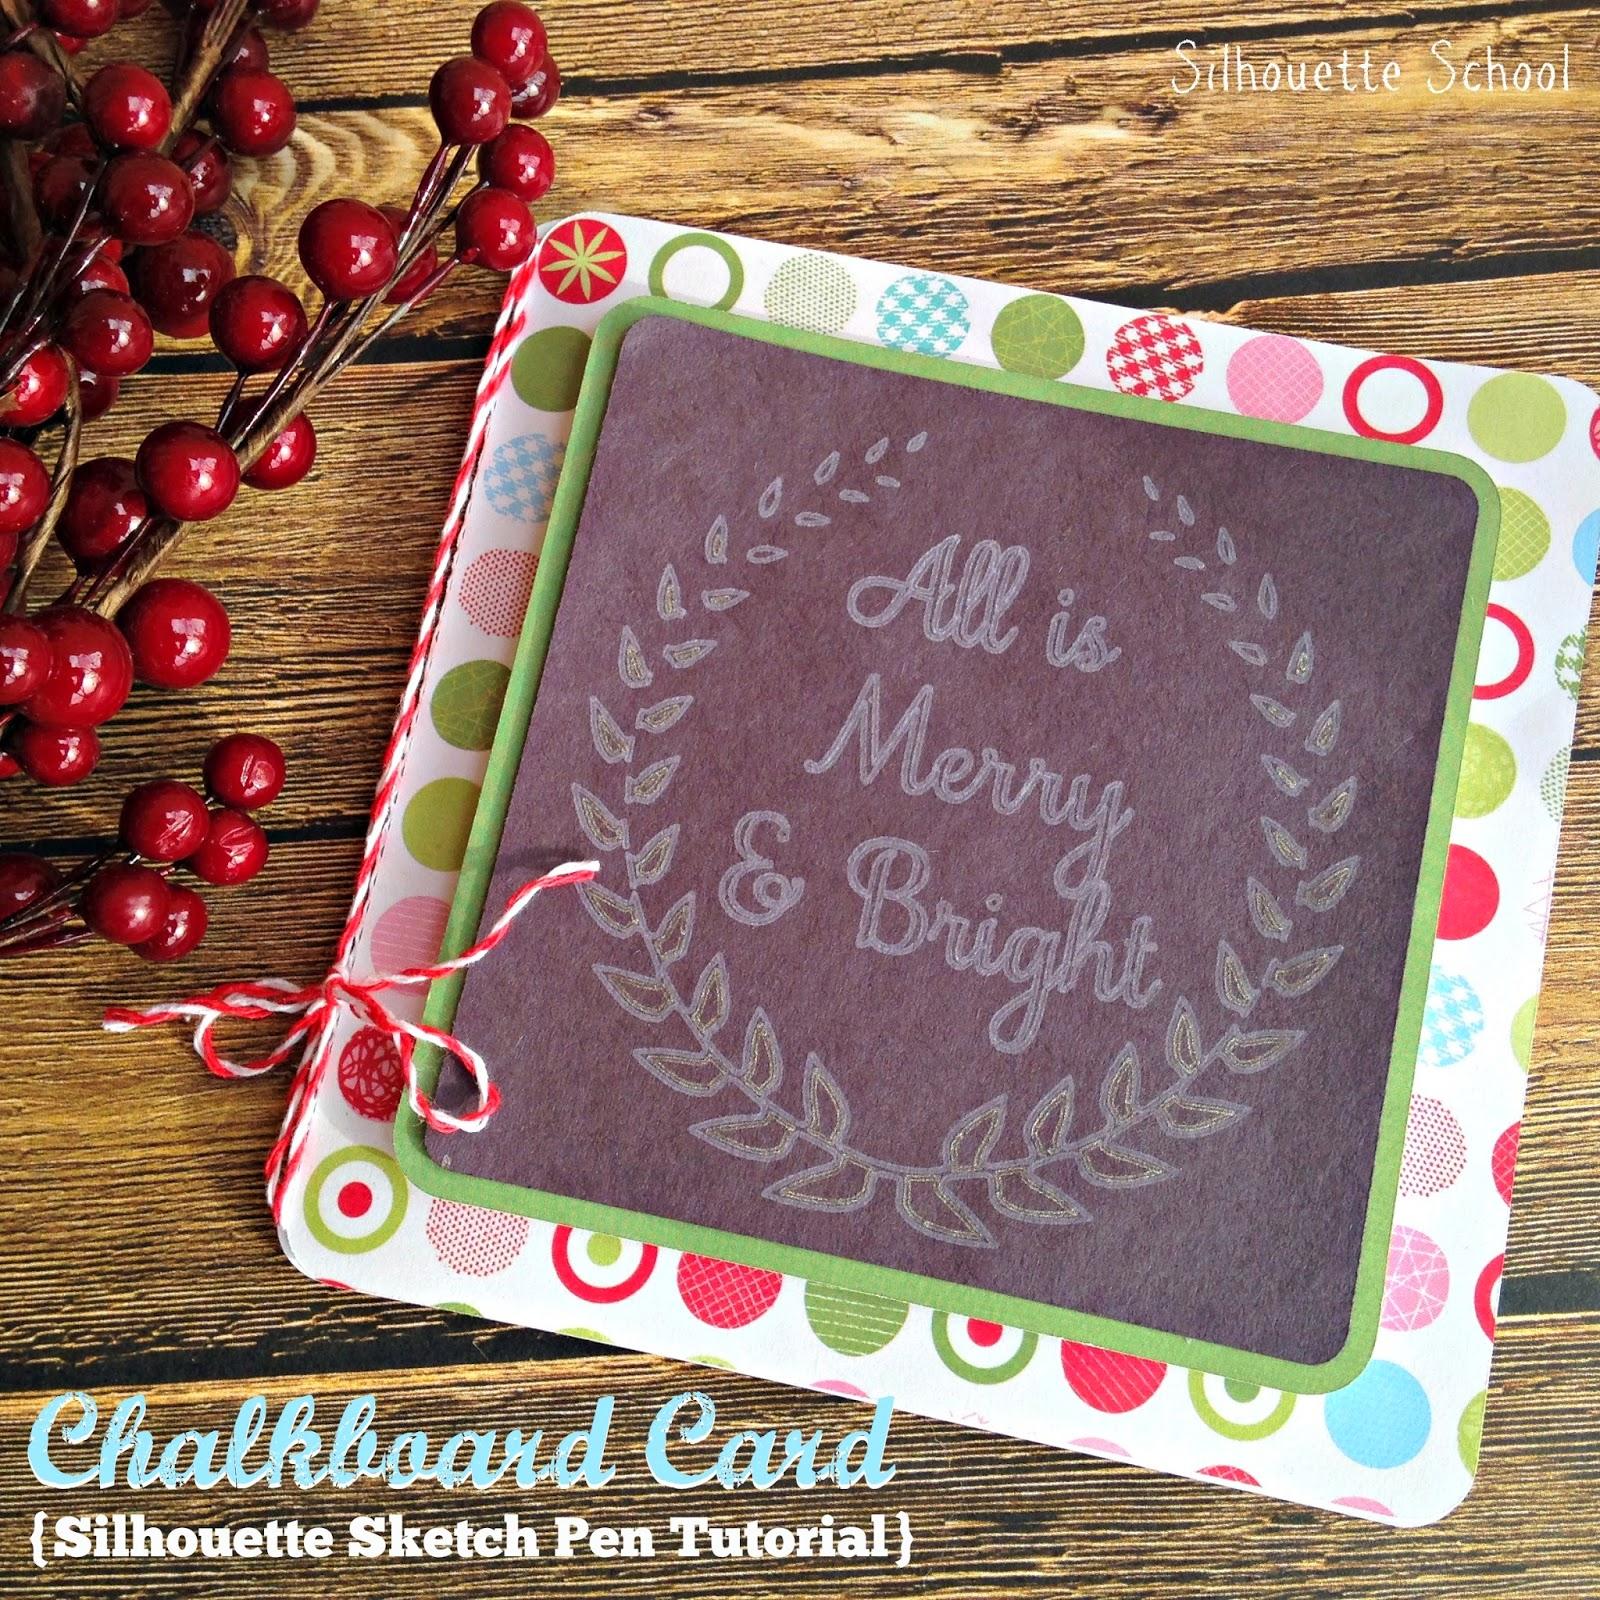 Faux chalkboard, Christmas card, Silhouette sketch pen, Silhouette tutorial, Silhouette Studio